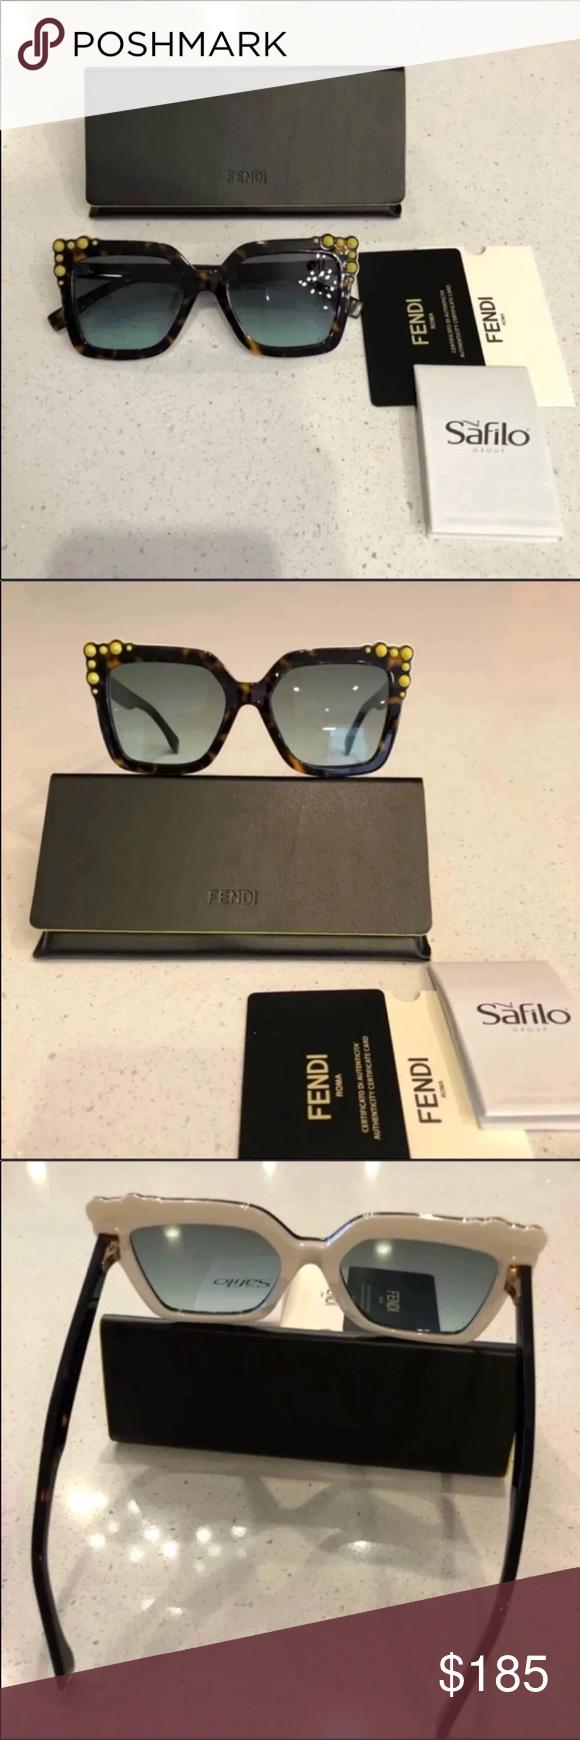 29941e07eec Spotted while shopping on Poshmark  Fendi sunglasses!  poshmark  fashion   shopping